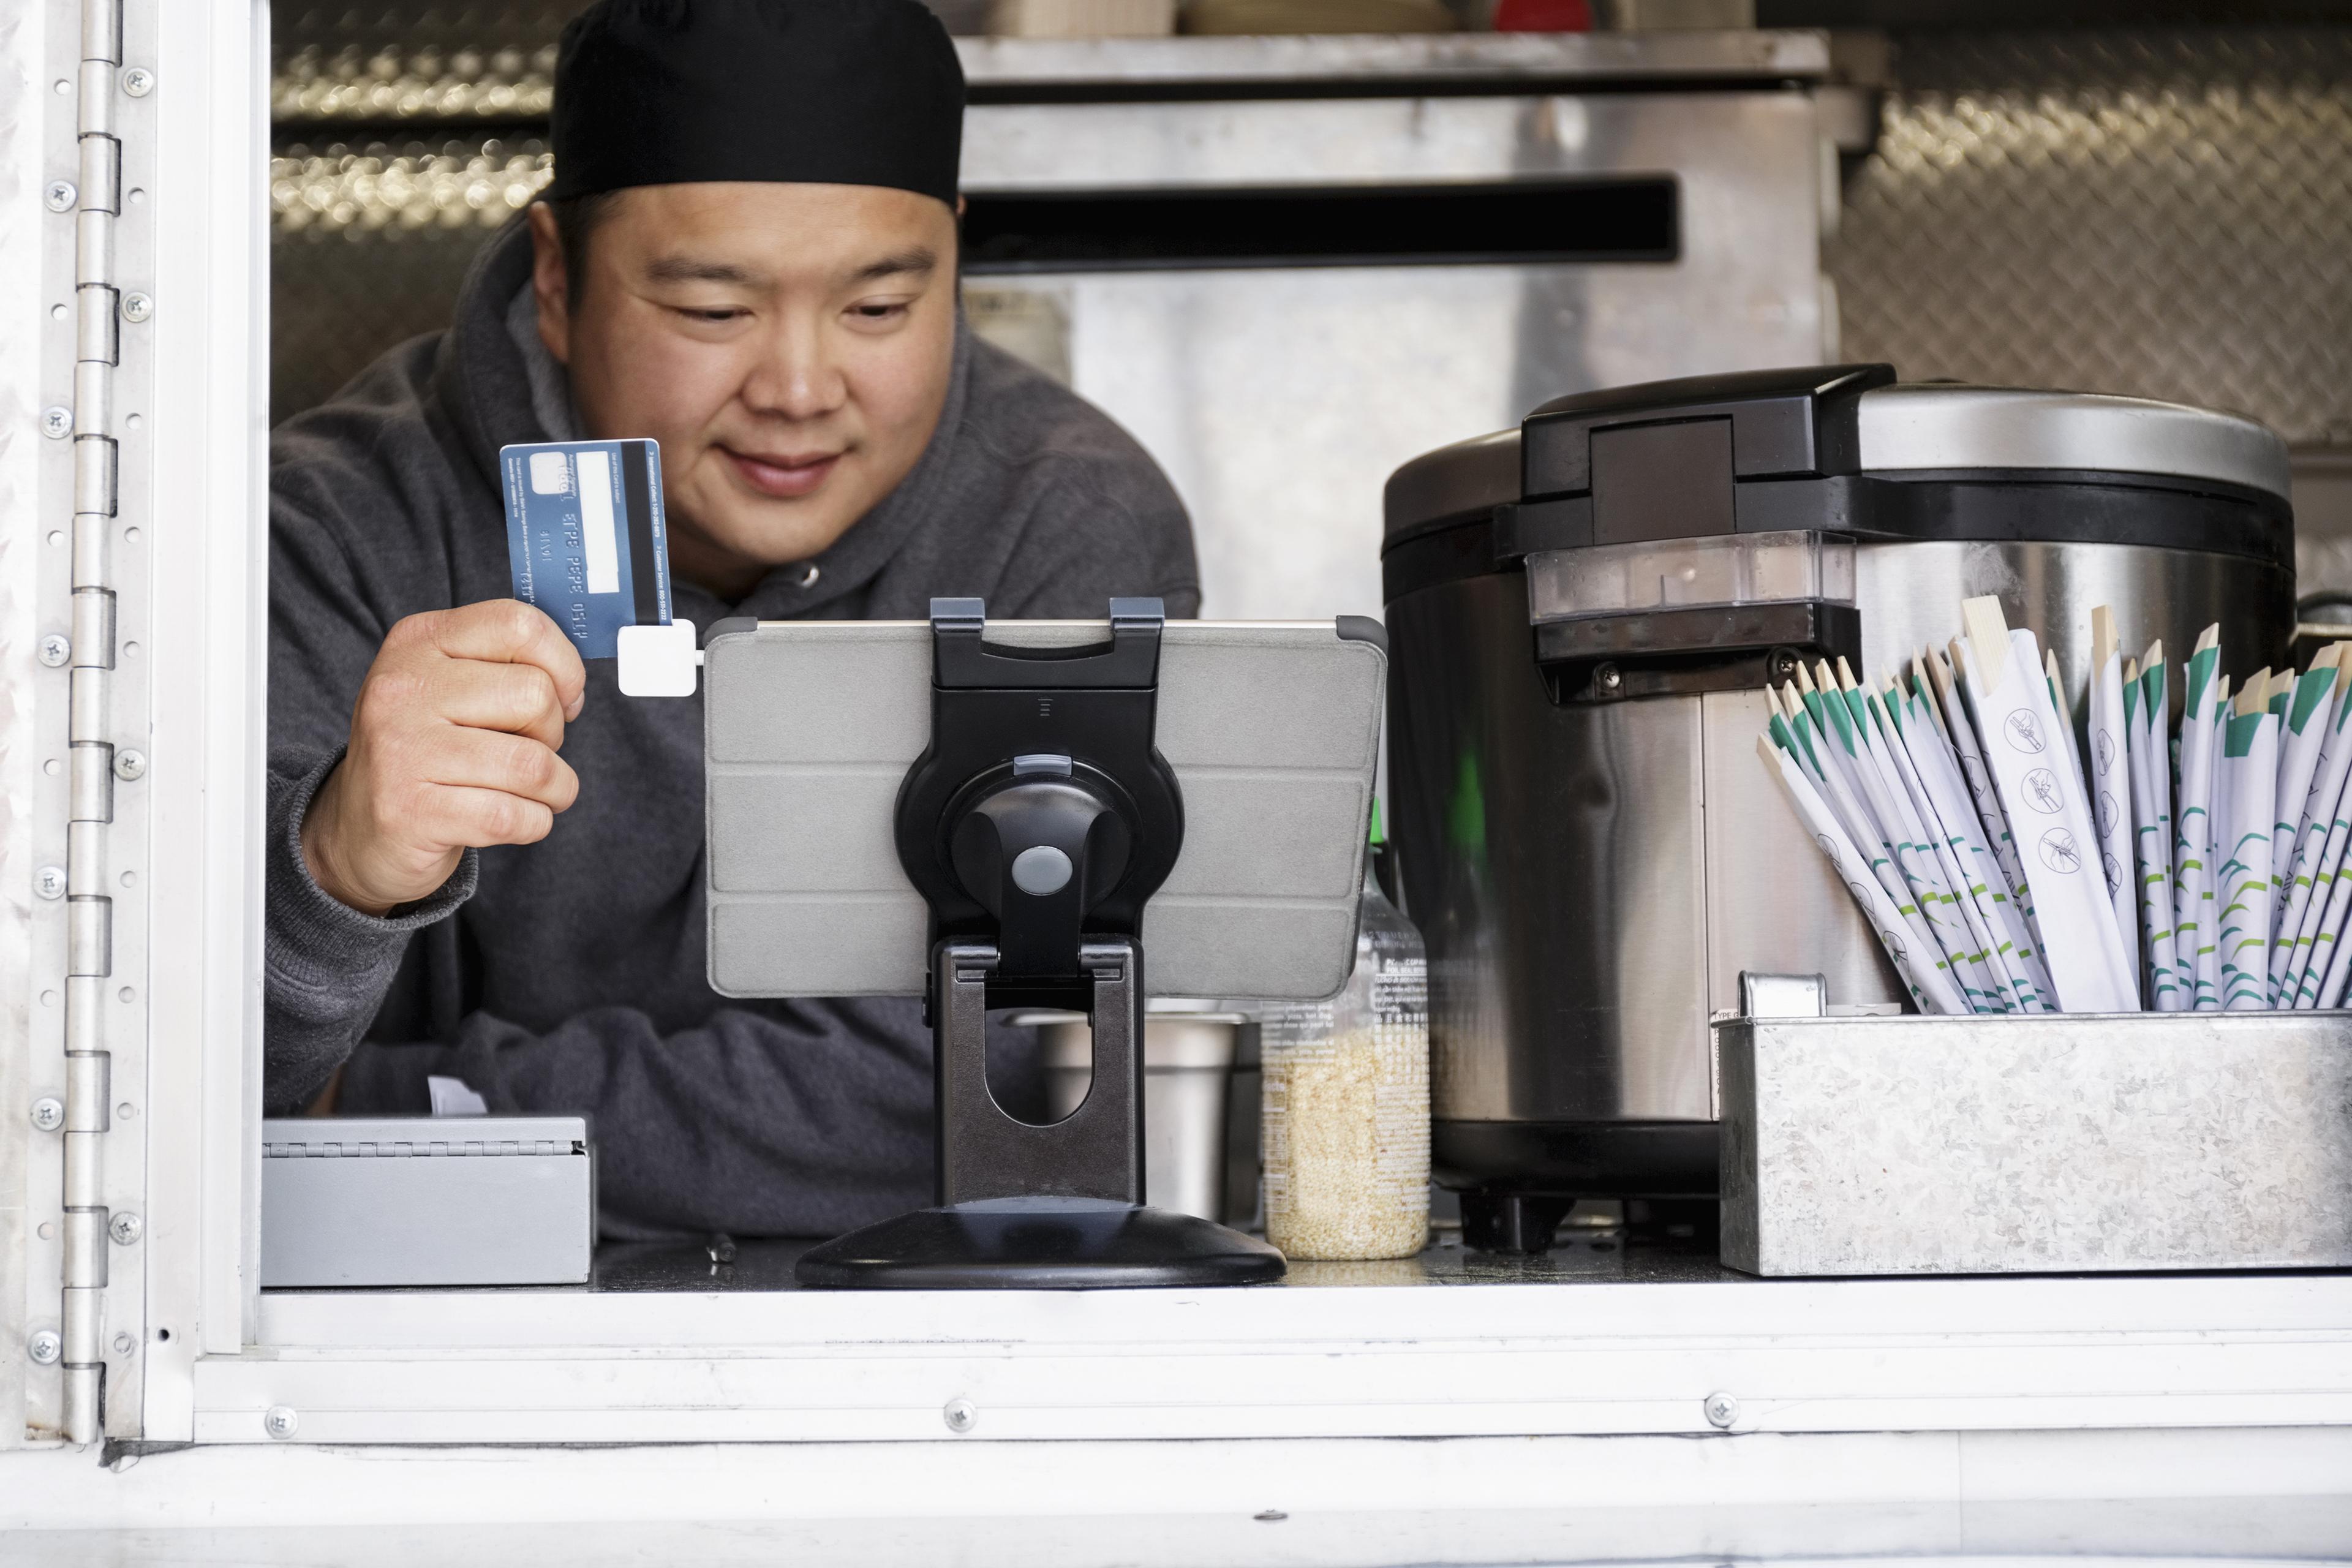 asian man processing credit card digital tablet food cart